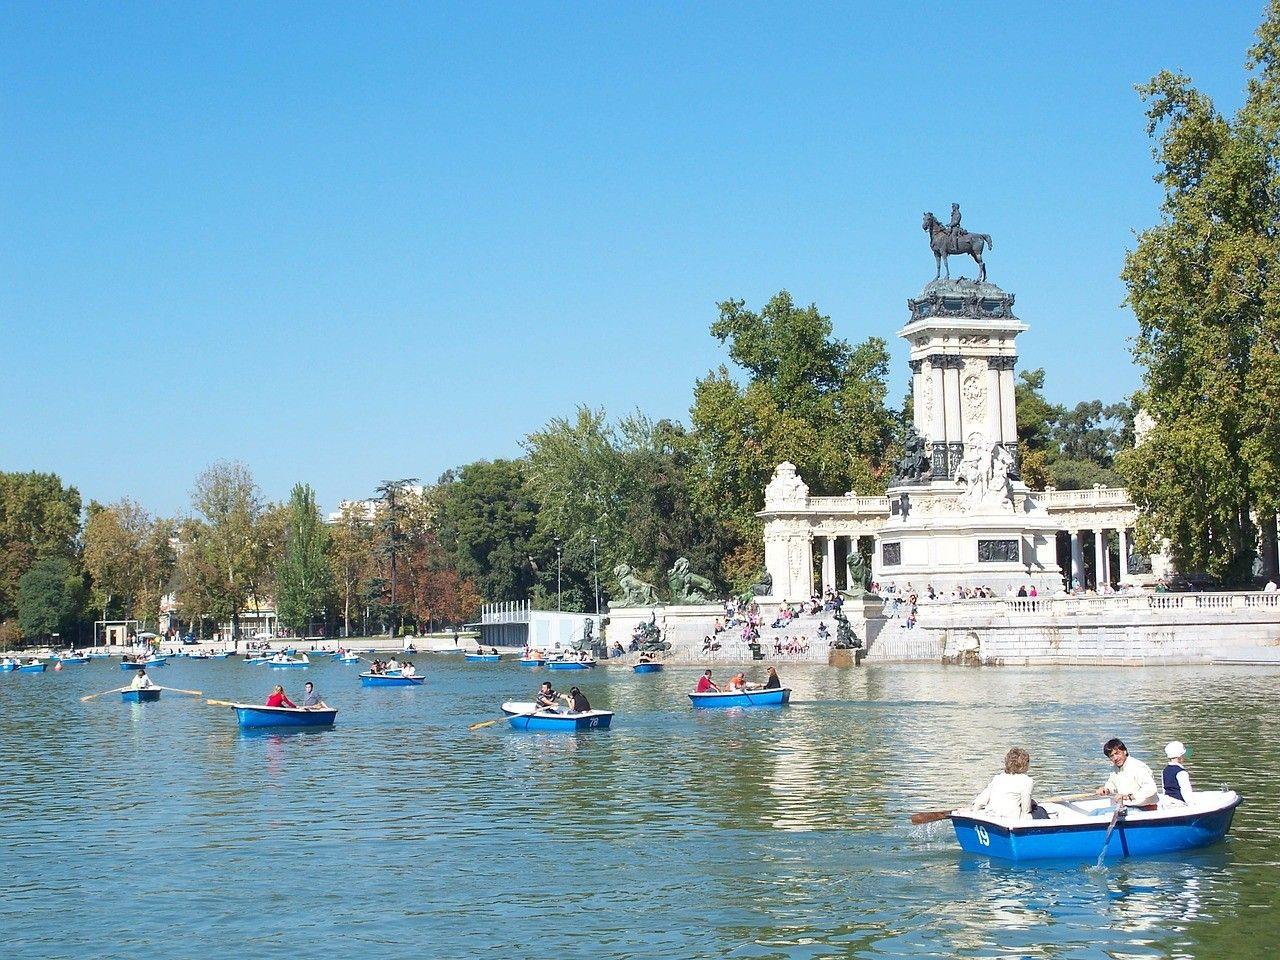 Paseos en barca en el #ParqueDelBuenRetiro de #Madrid. http://www.viajaramadrid.org/?page=paseodelpradoyretiro.php #turismo #guia #viajar